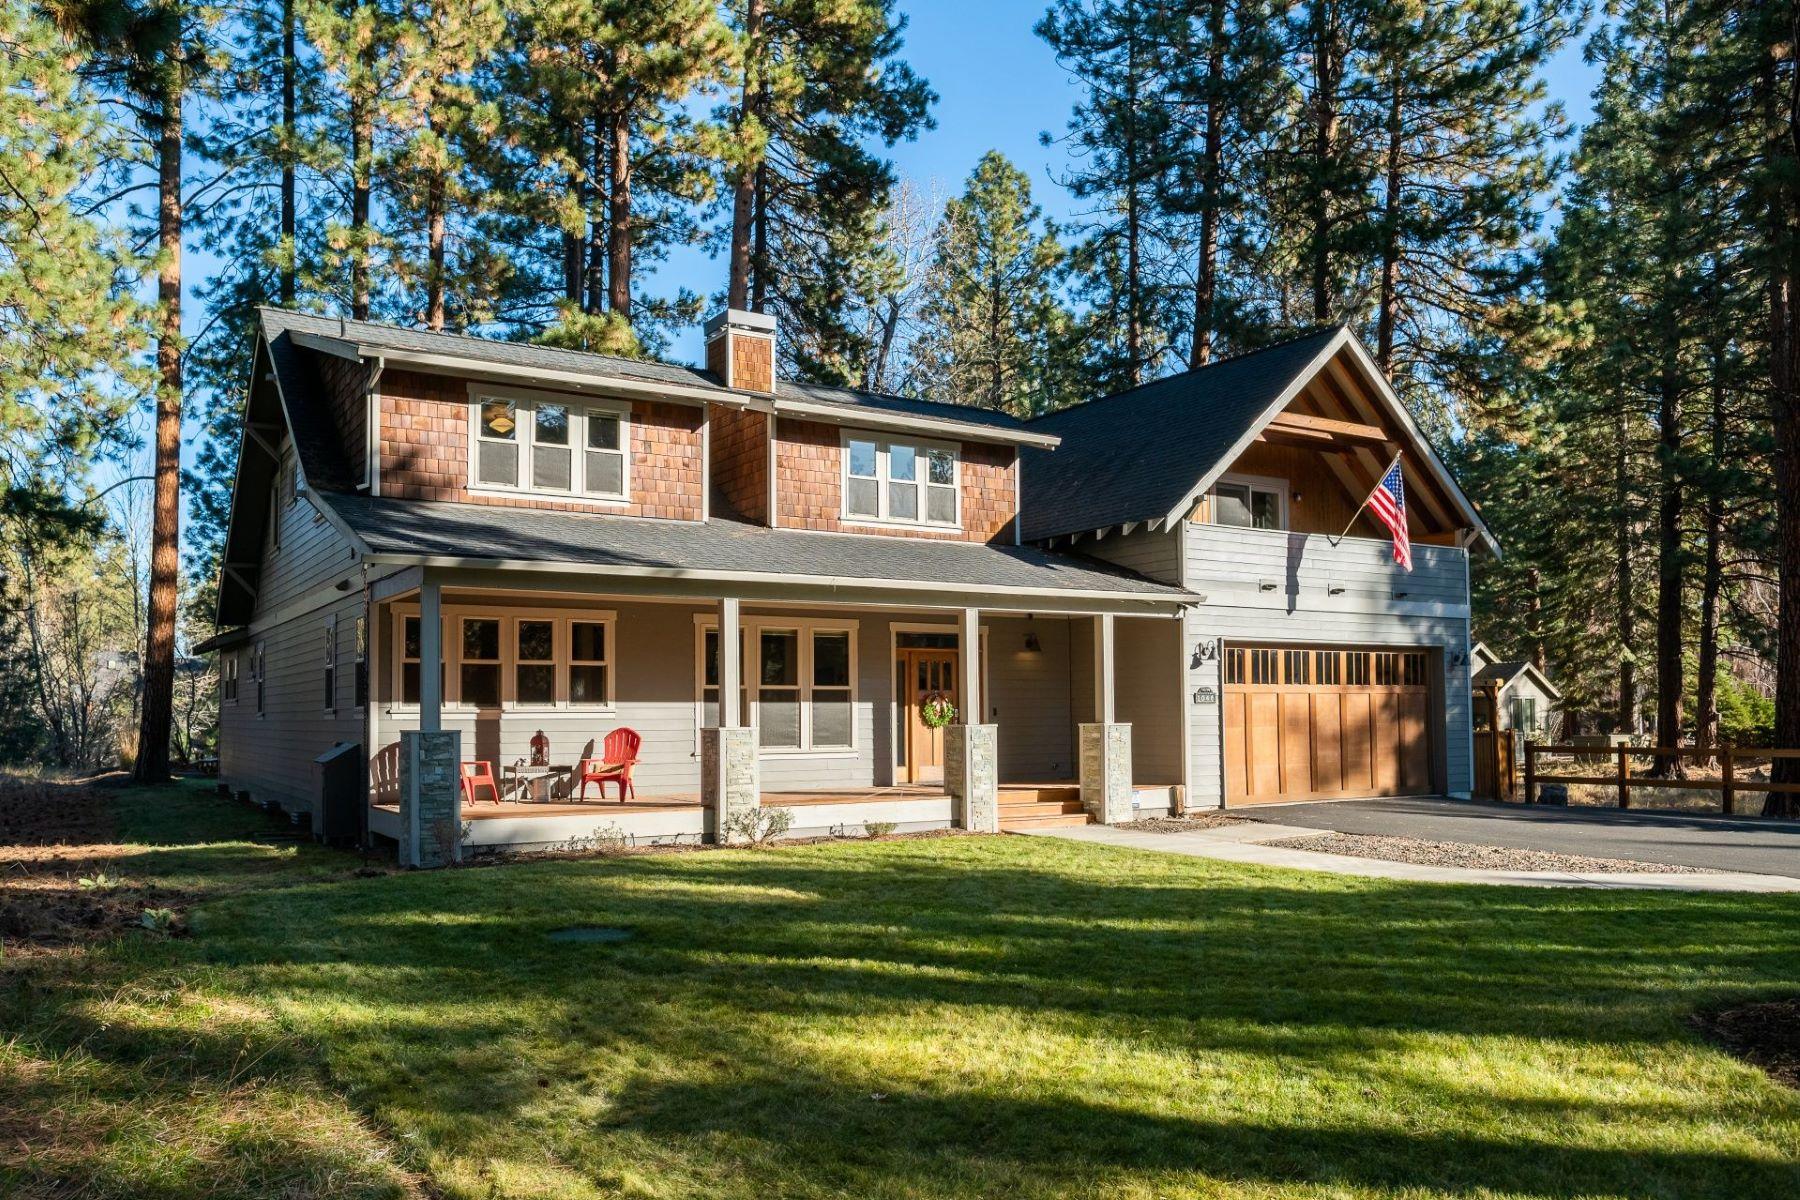 Other Residential Homes για την Πώληση στο 1046 E Creekside Court Sisters, OR 97759 Sisters, Ορεγκον 97759 Ηνωμένες Πολιτείες